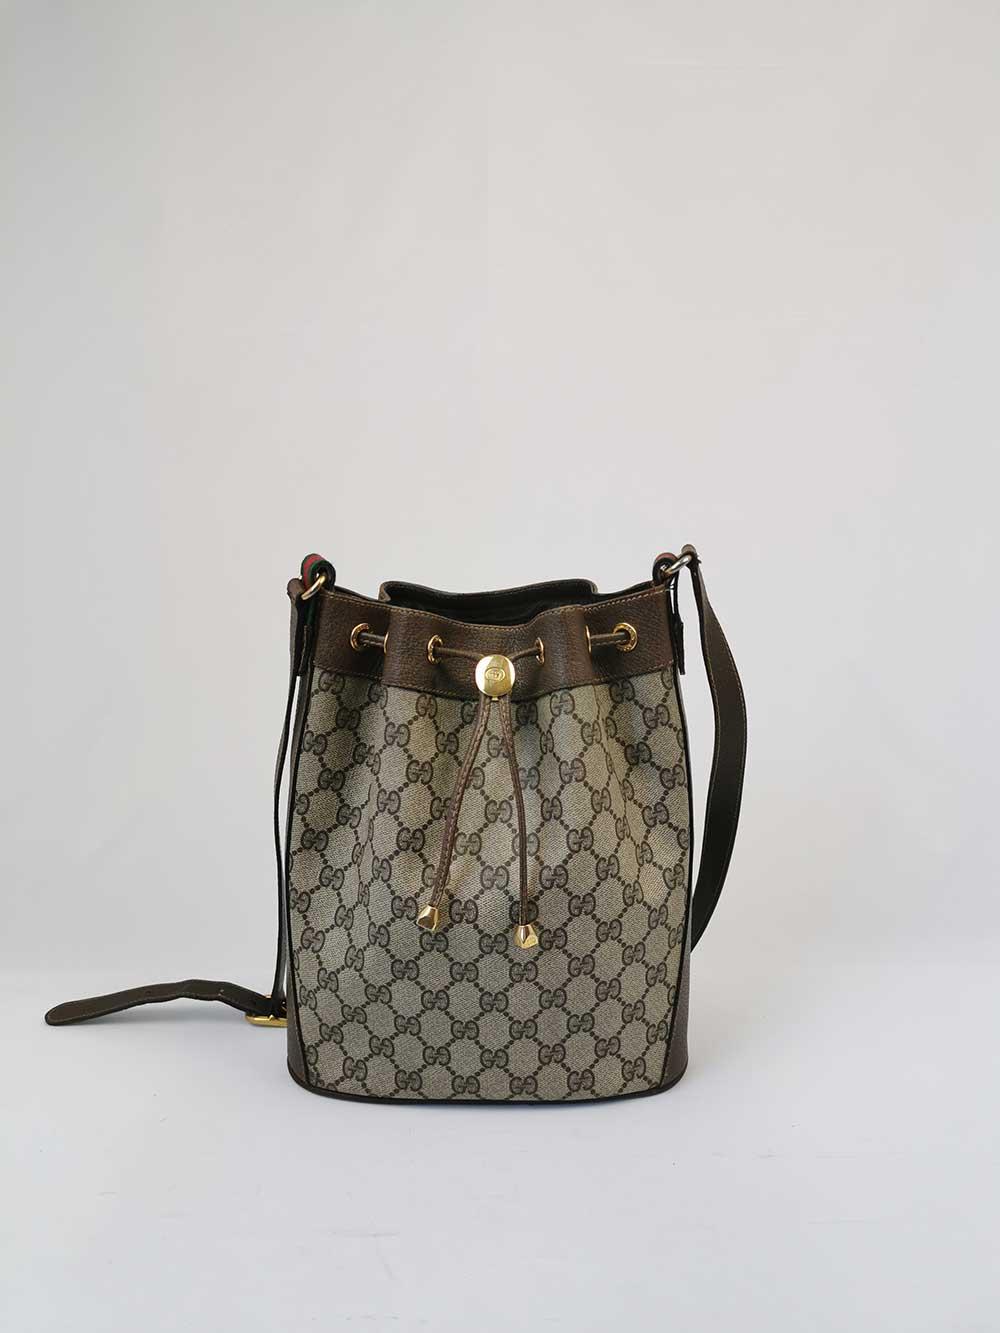 Gucci Ophidia Bucket Vintage Handbag